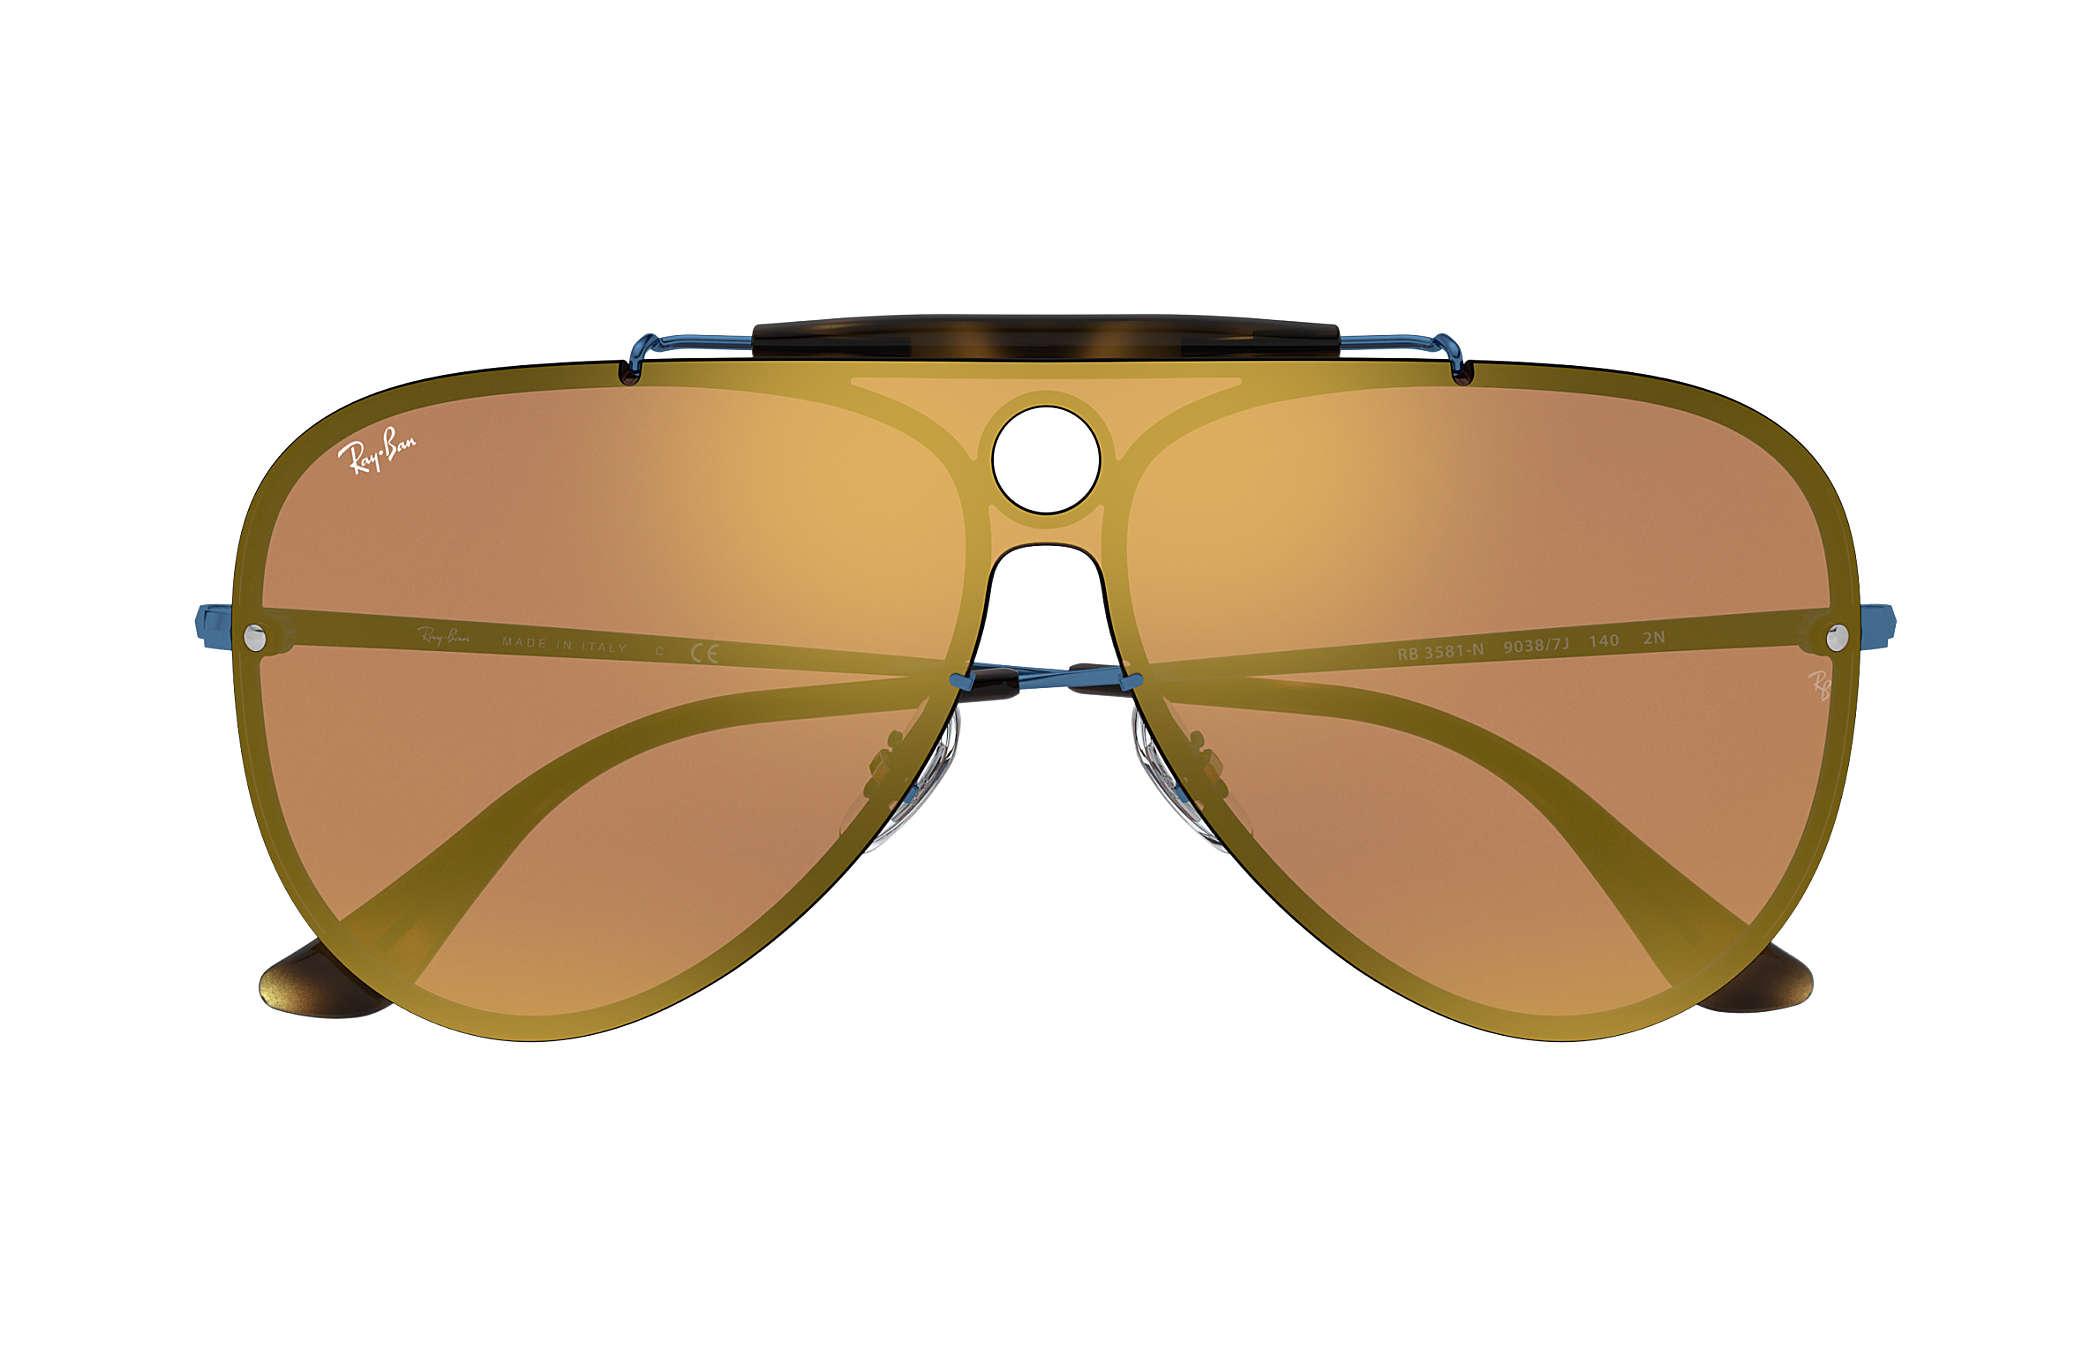 47ba88ef088 Ray-Ban Blaze Shooter RB3581N Blue - Metal - Dark Orange Lenses ...